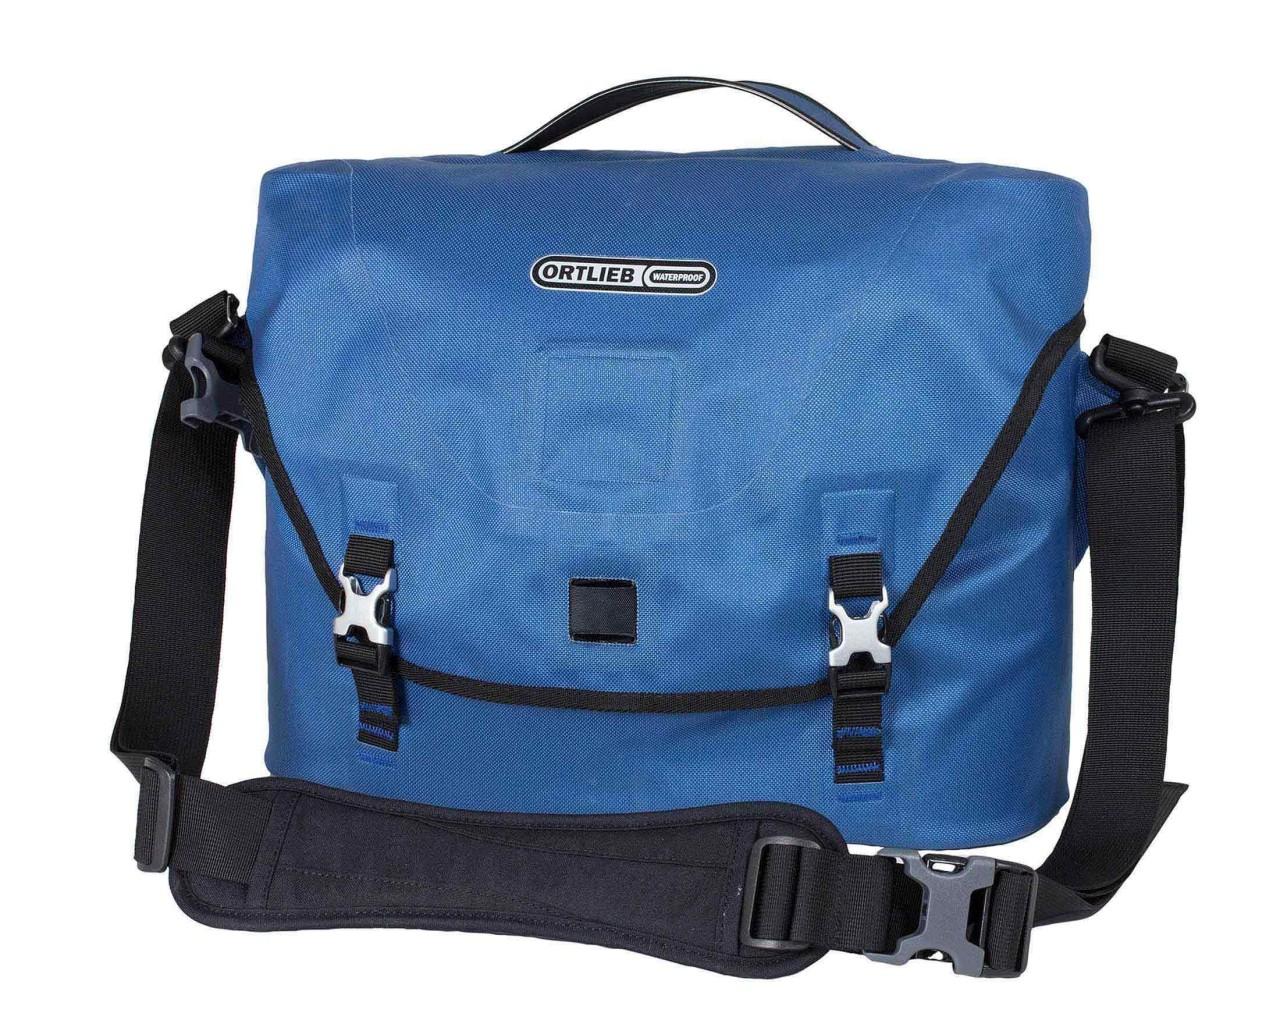 Ortlieb Courier-Bag City waterproof shoulder bag   PVC-free - size L   stealblue